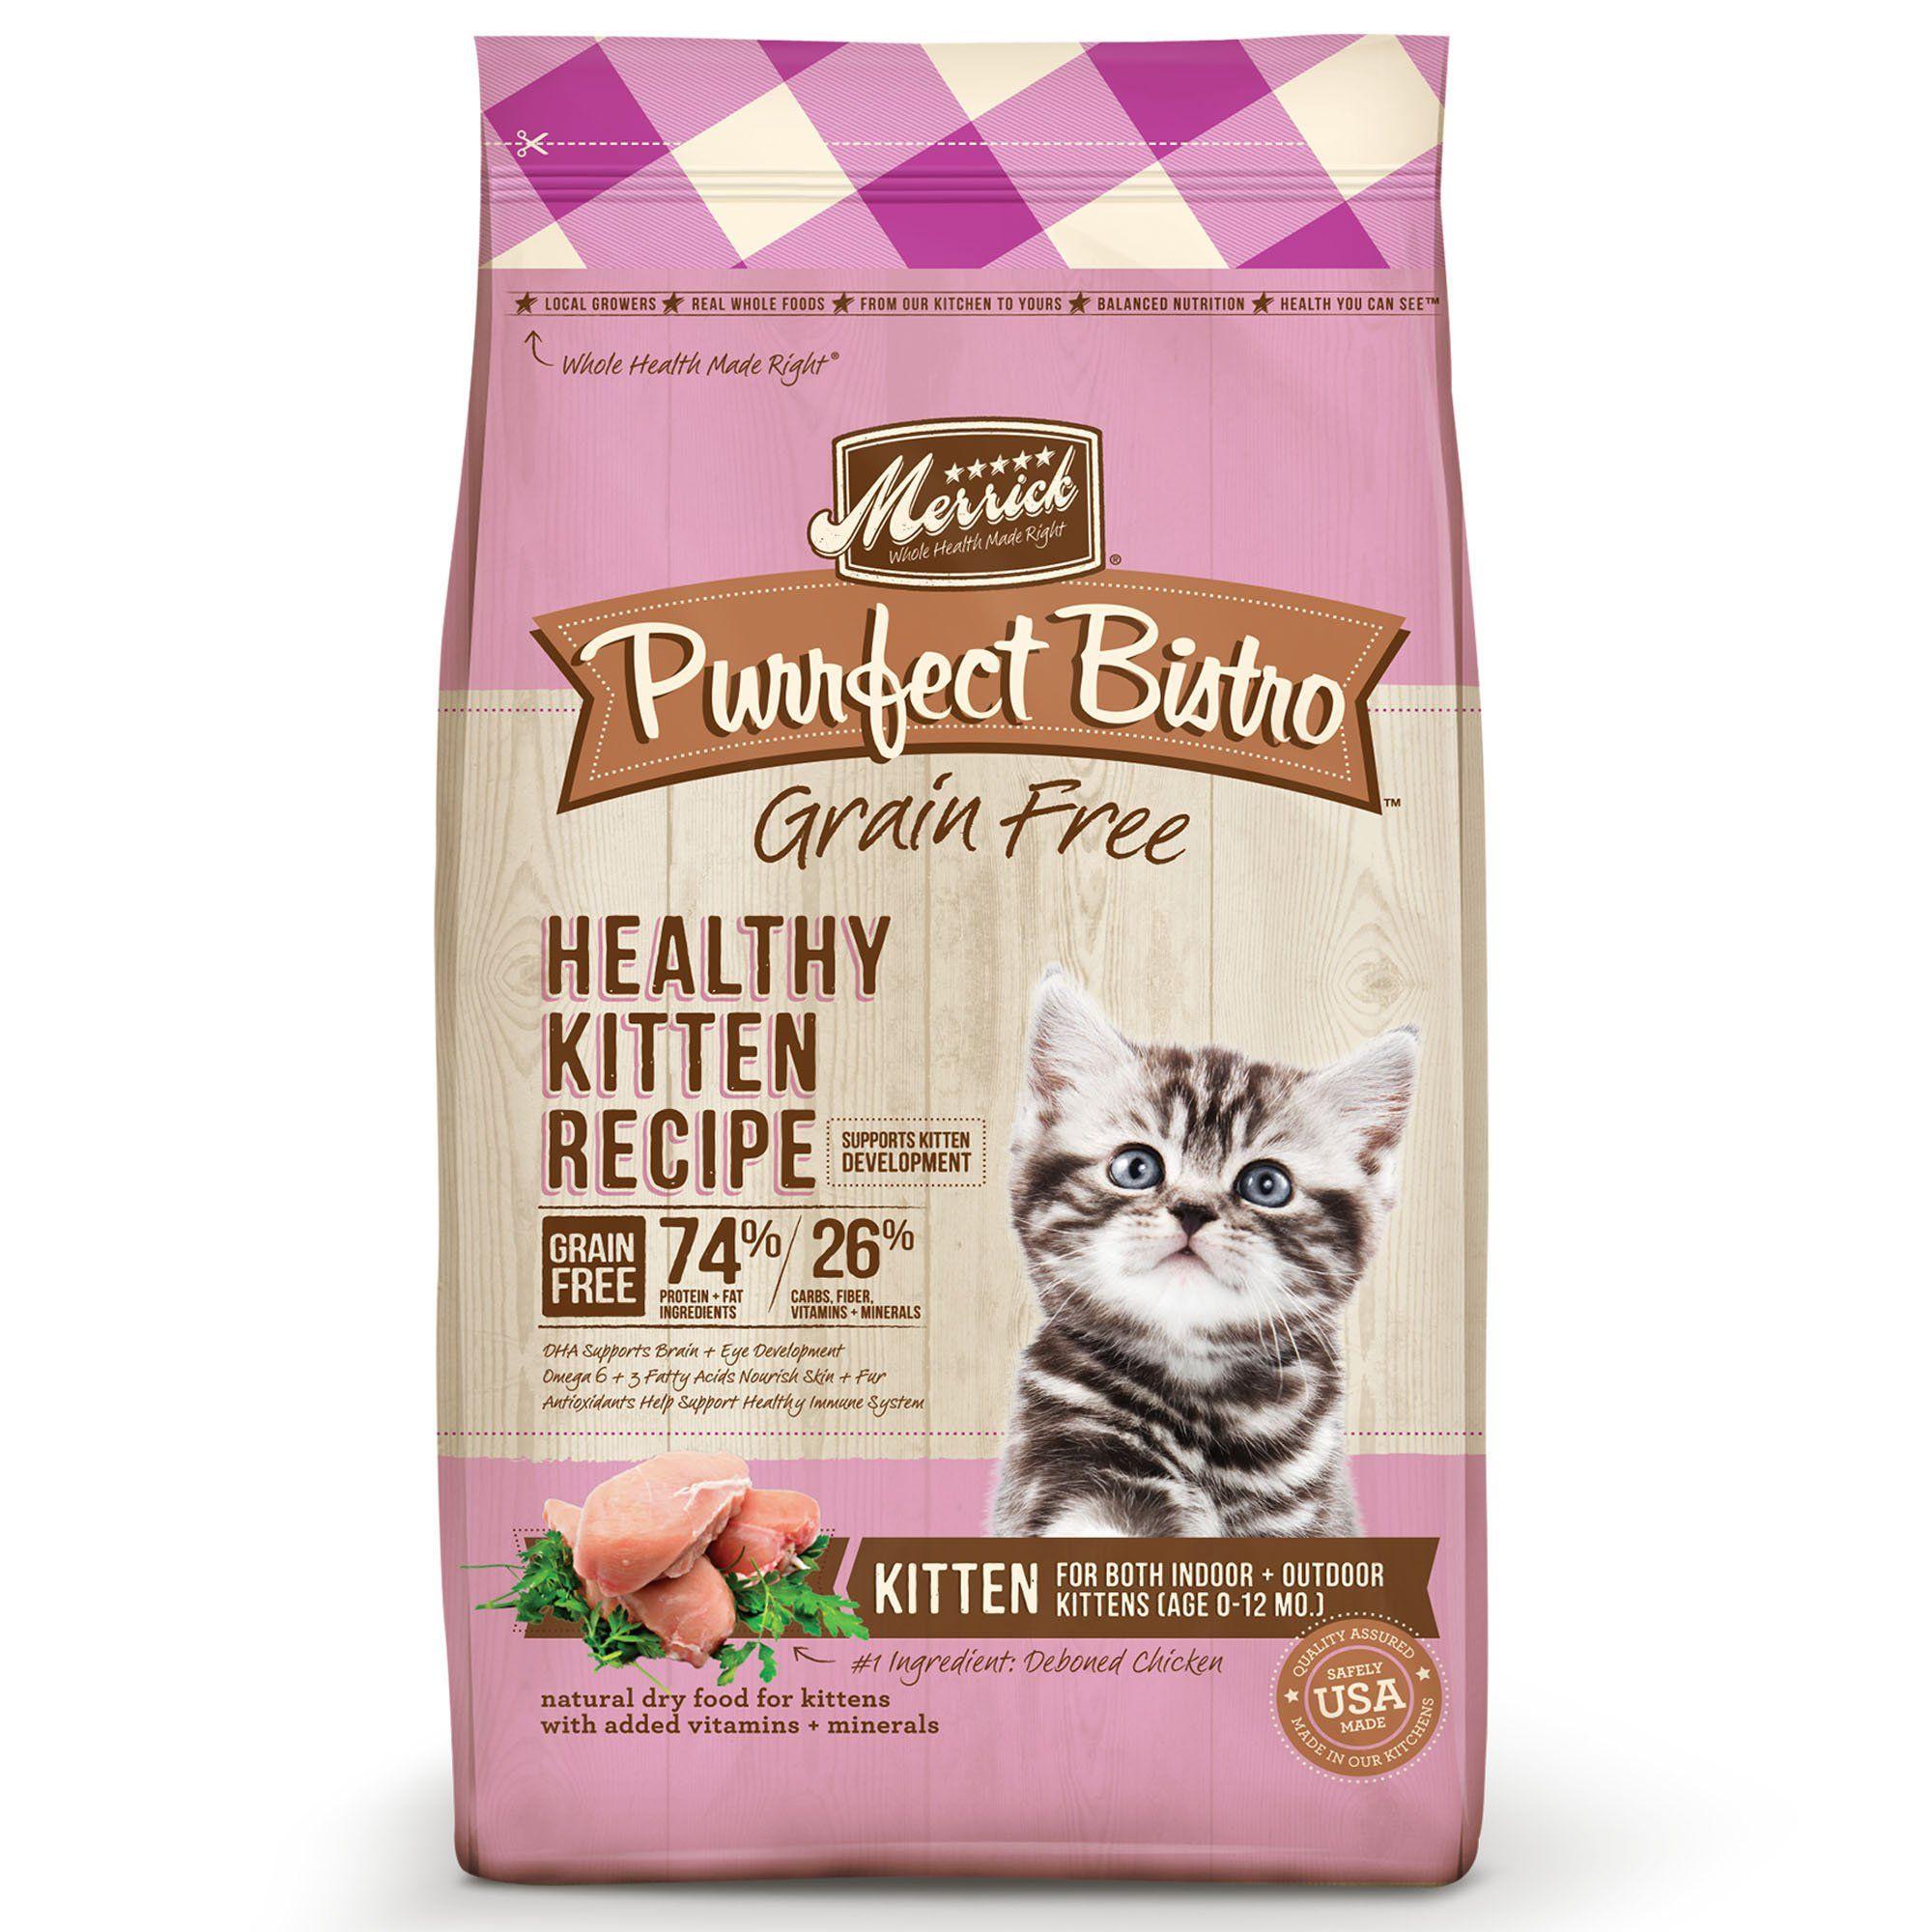 Merrick Purrfect Bistro Grain Free Healthy Kitten Dry Food 4 Lbs Kitten Food Dry Cat Food Free Cat Food